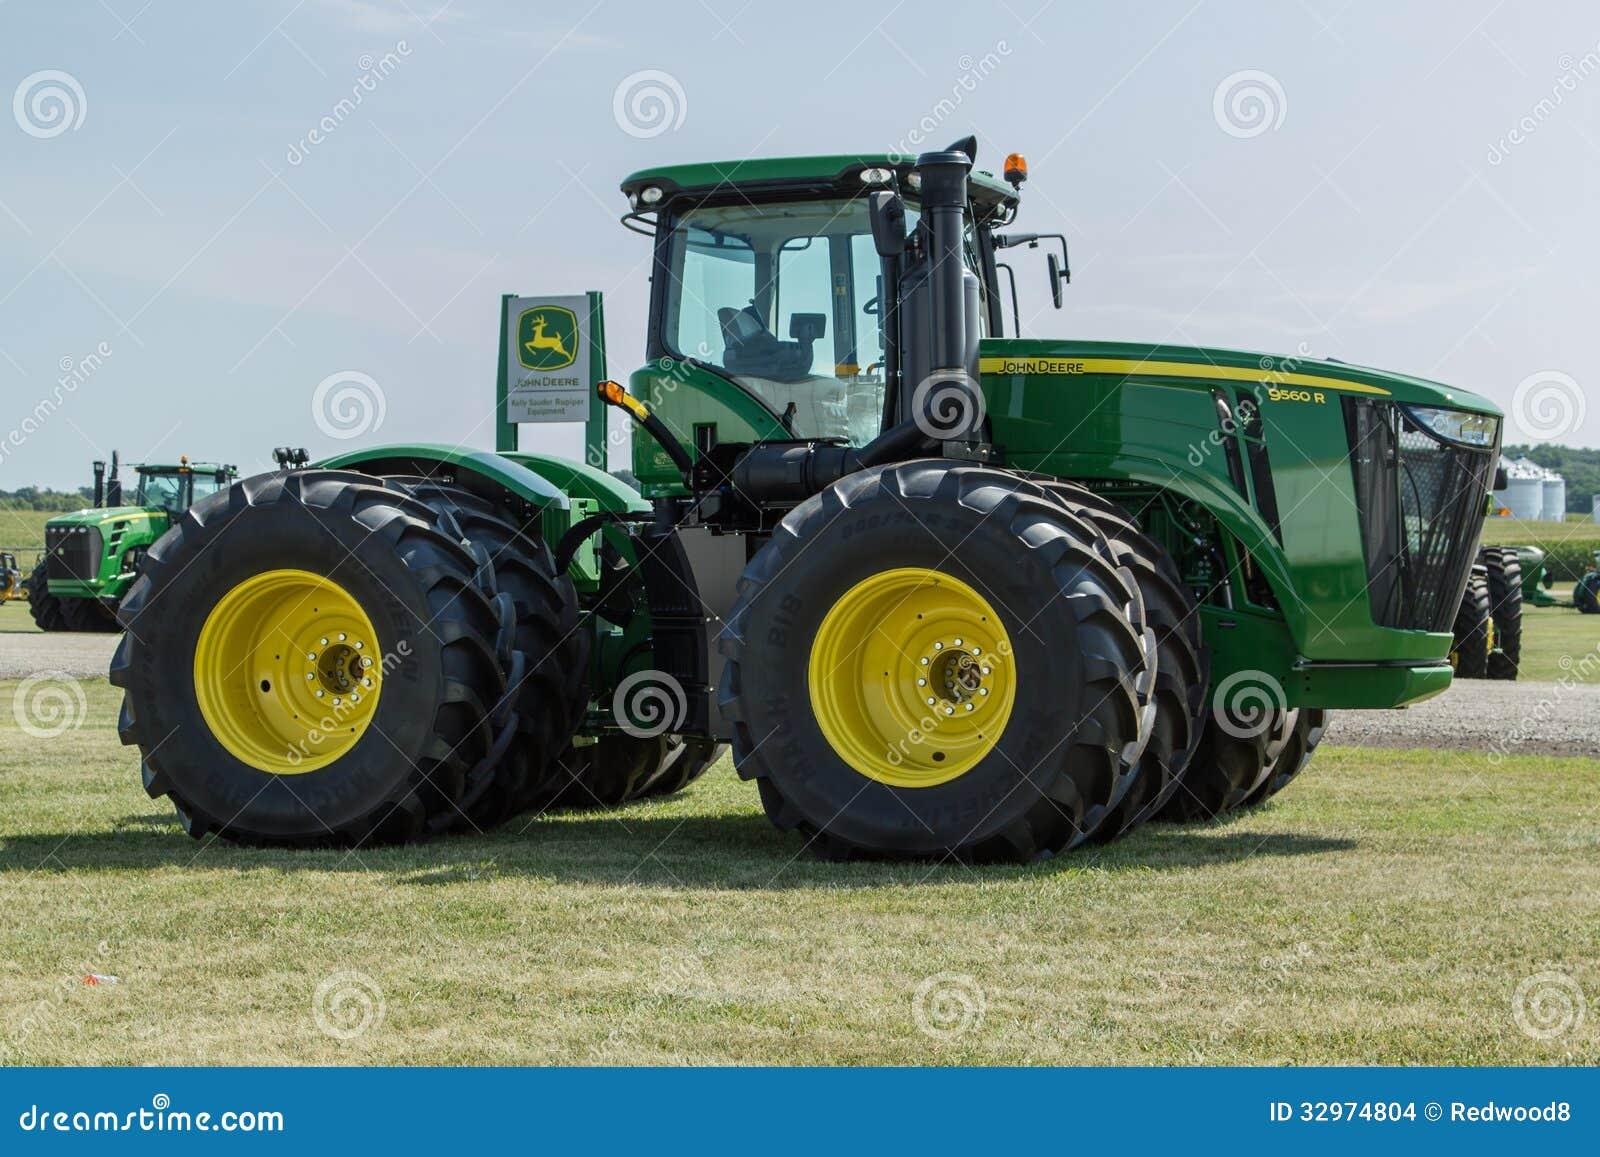 4 Wheel Drive Farm Tractors : John deere wheel drive tractor editorial stock image